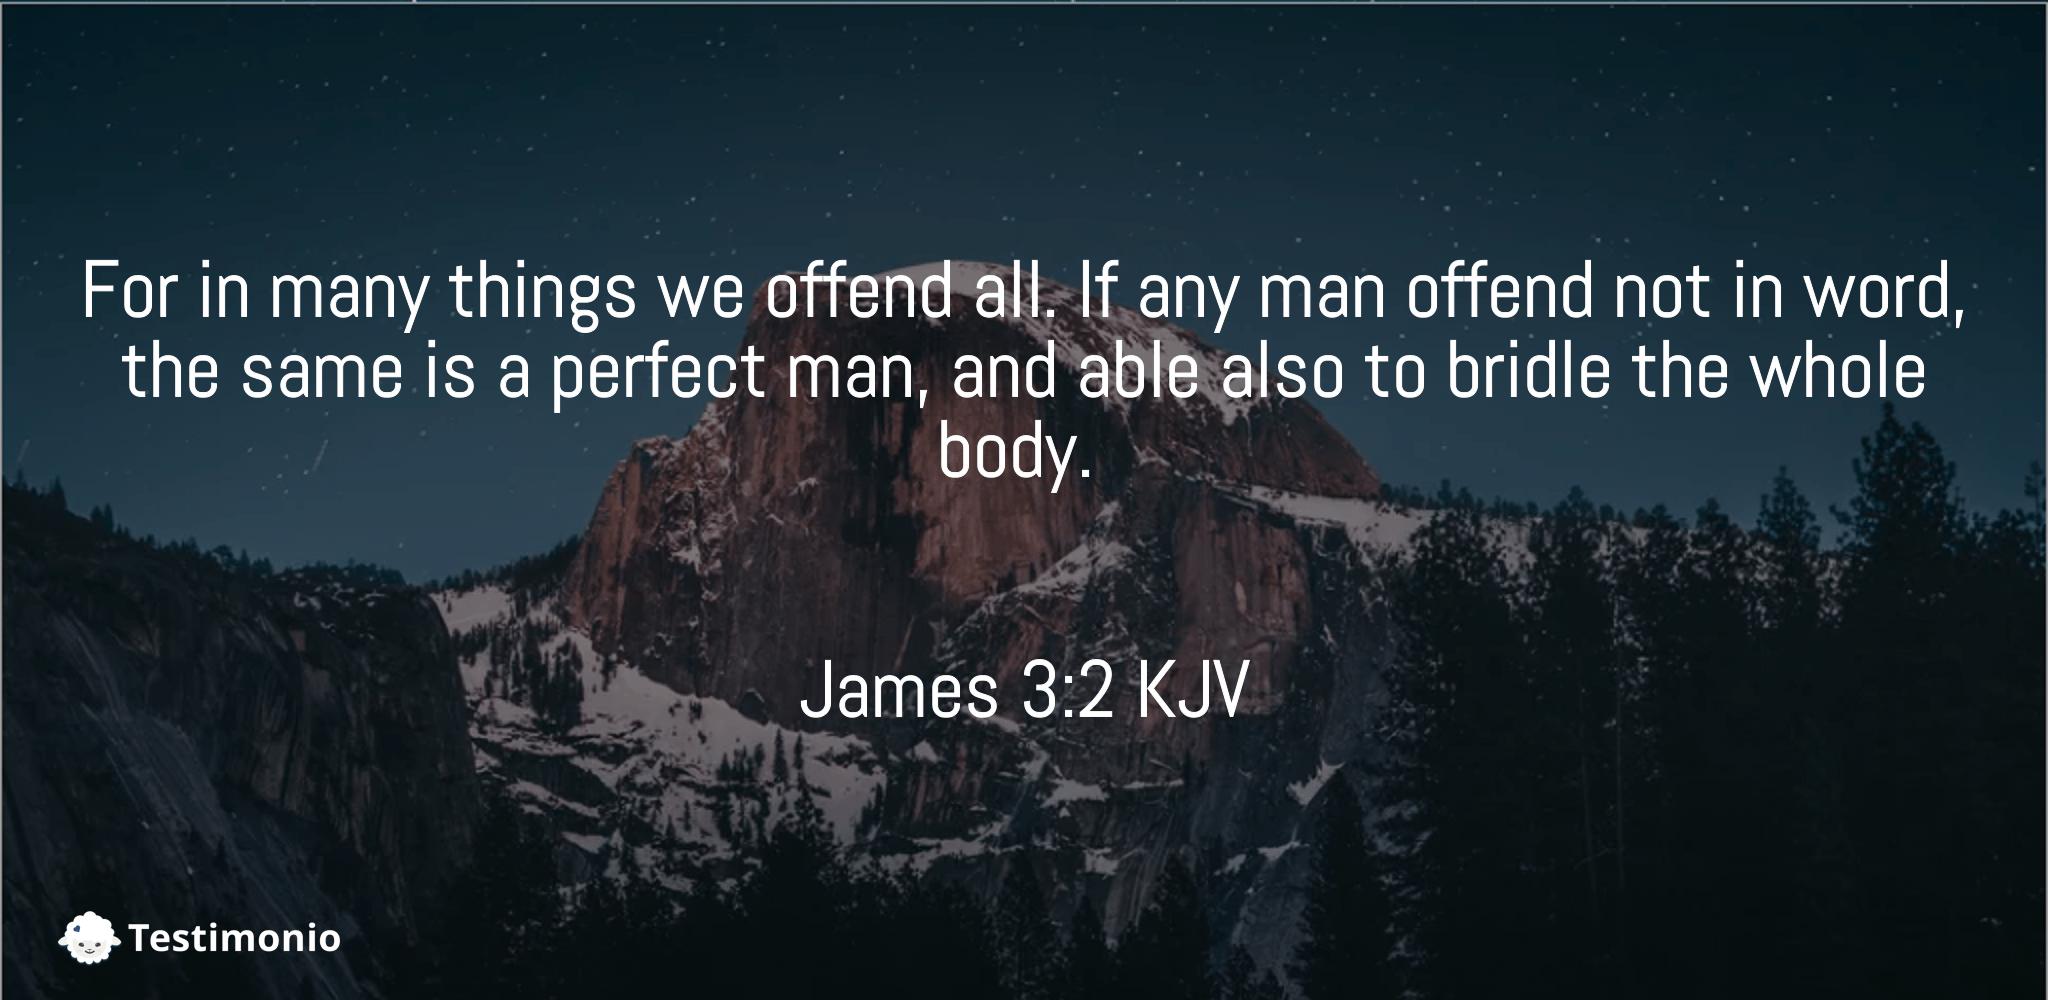 James 3:2